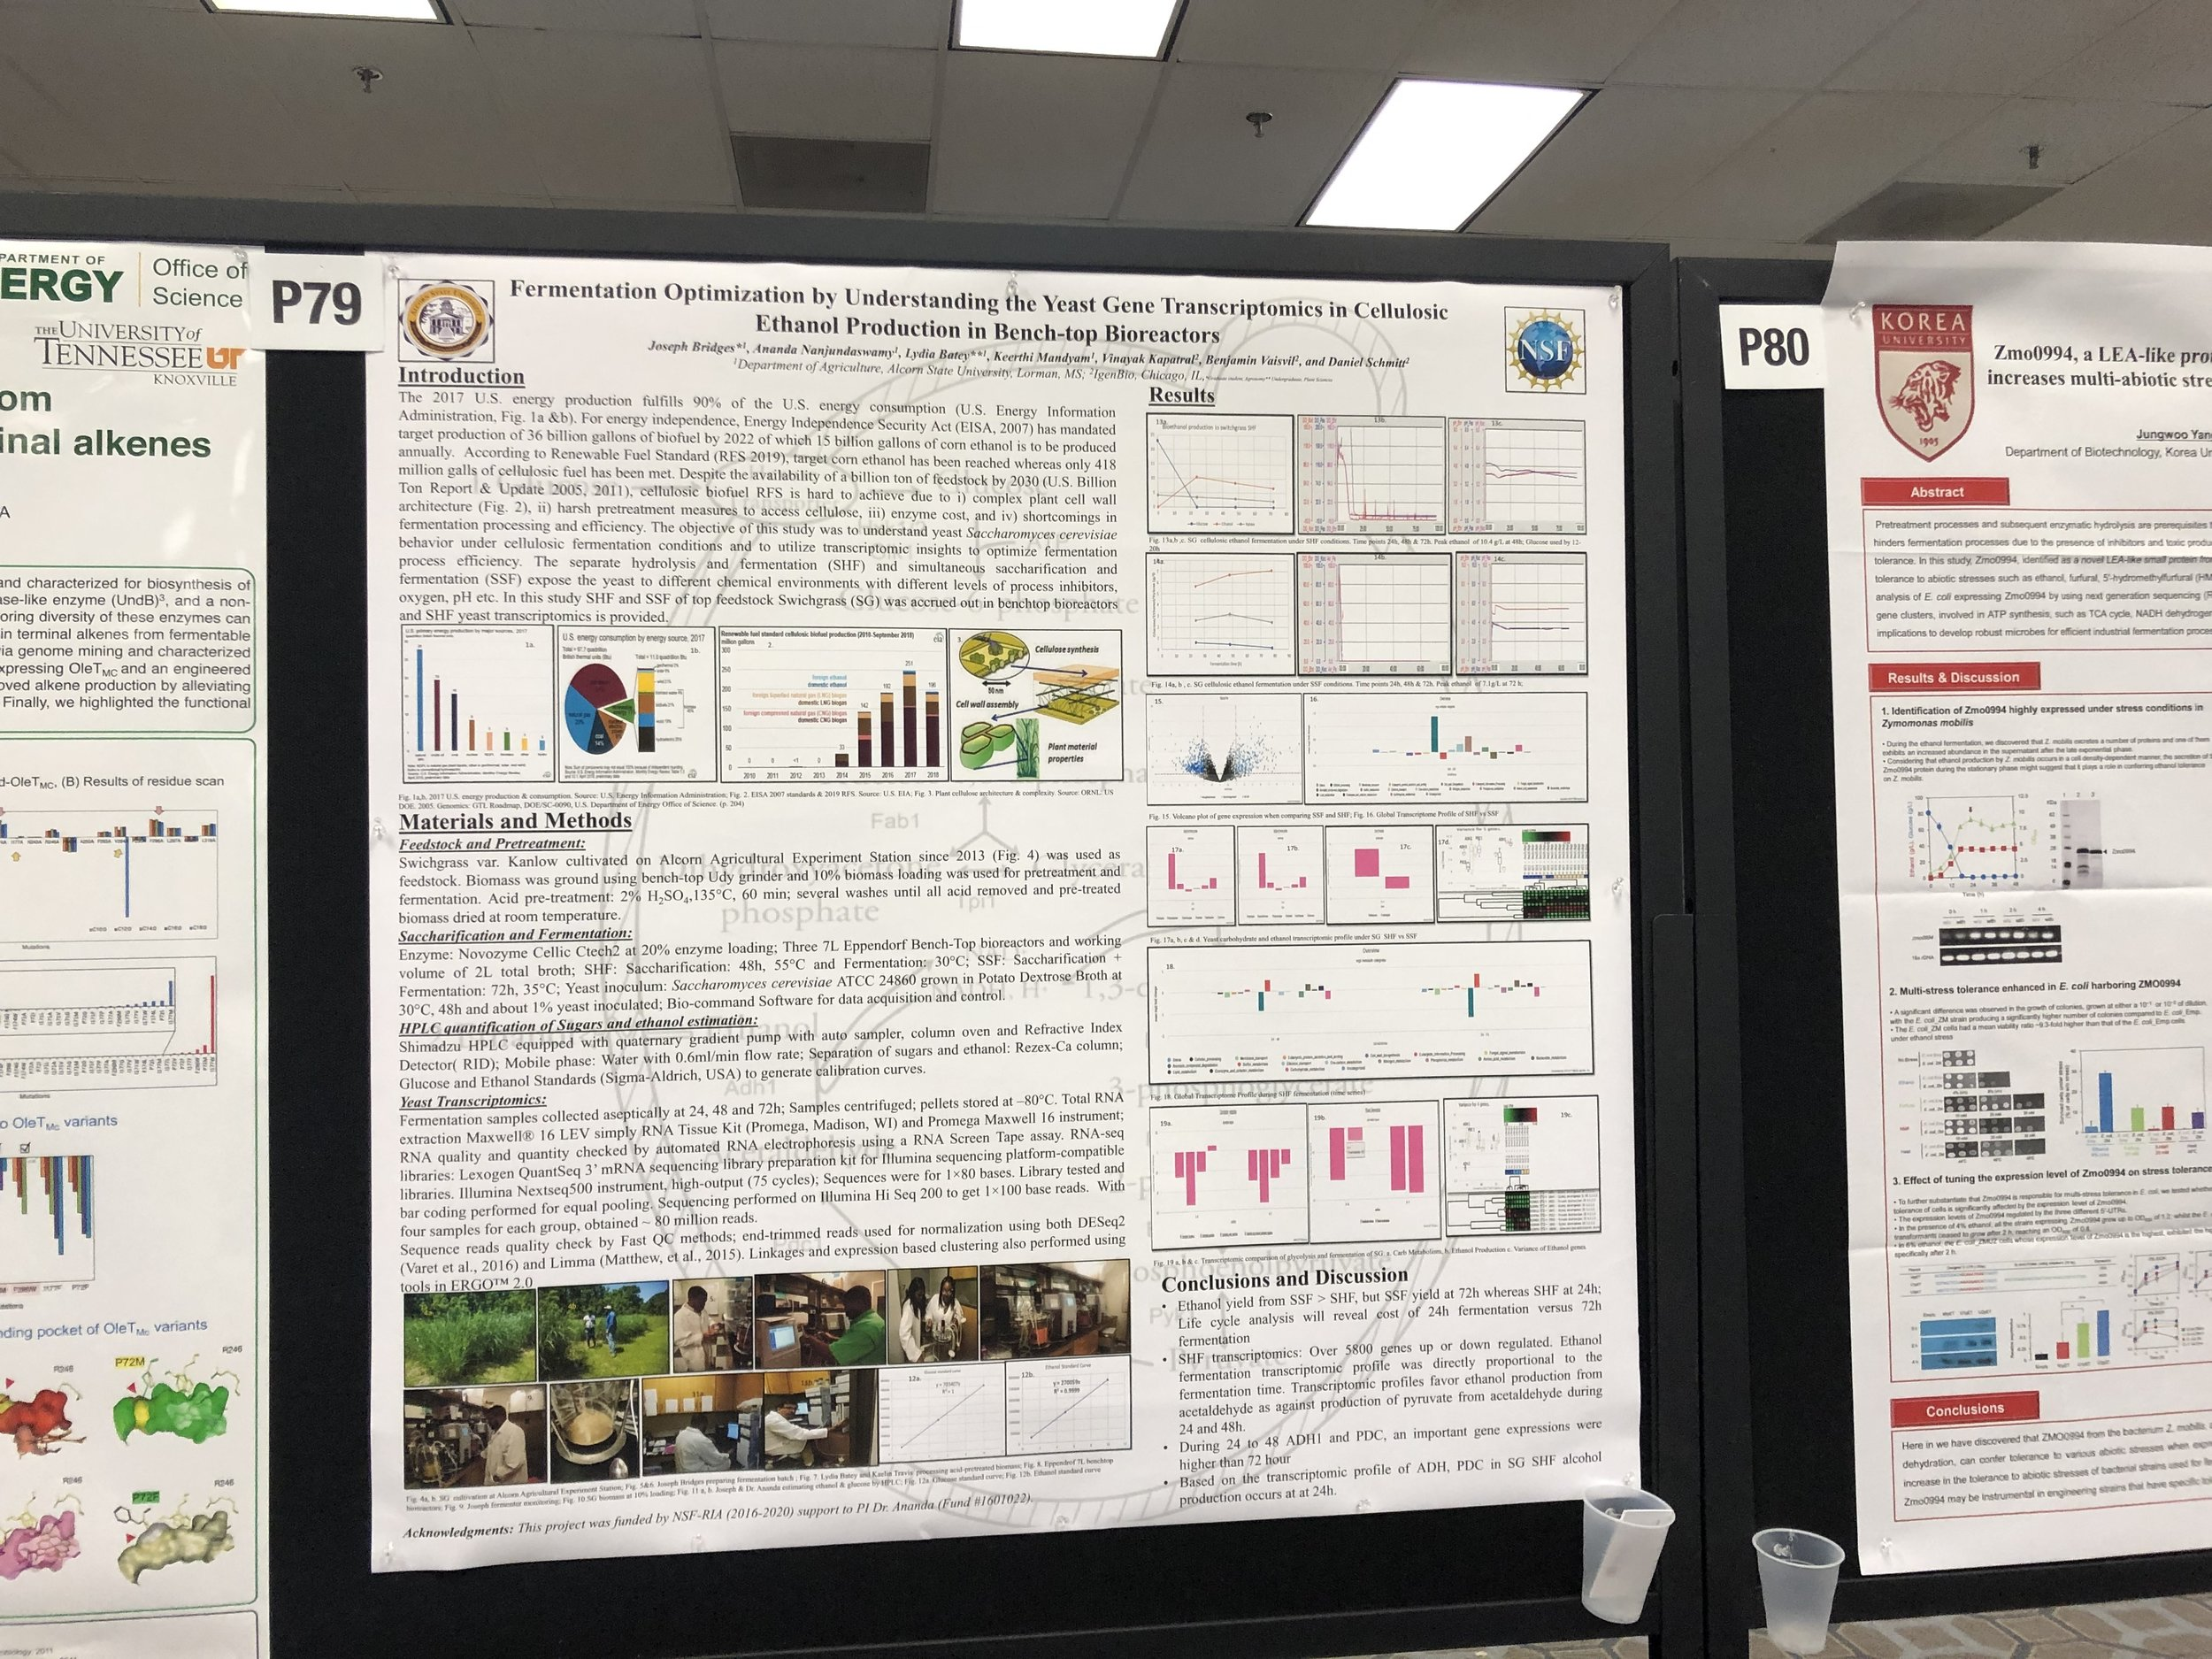 SIMB 2019 - Poster presentation